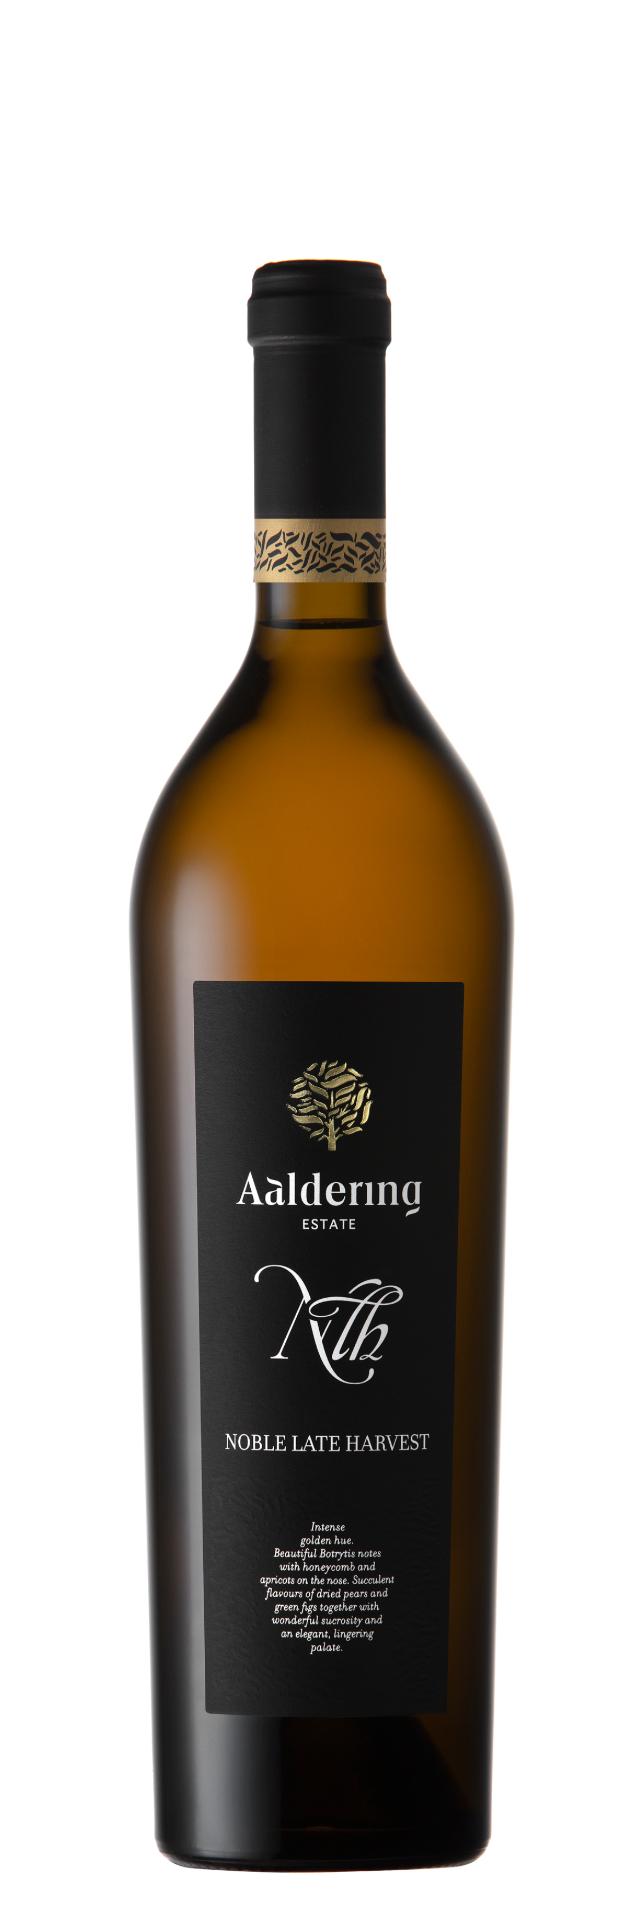 Aaldering Noble Late Harvest 2016